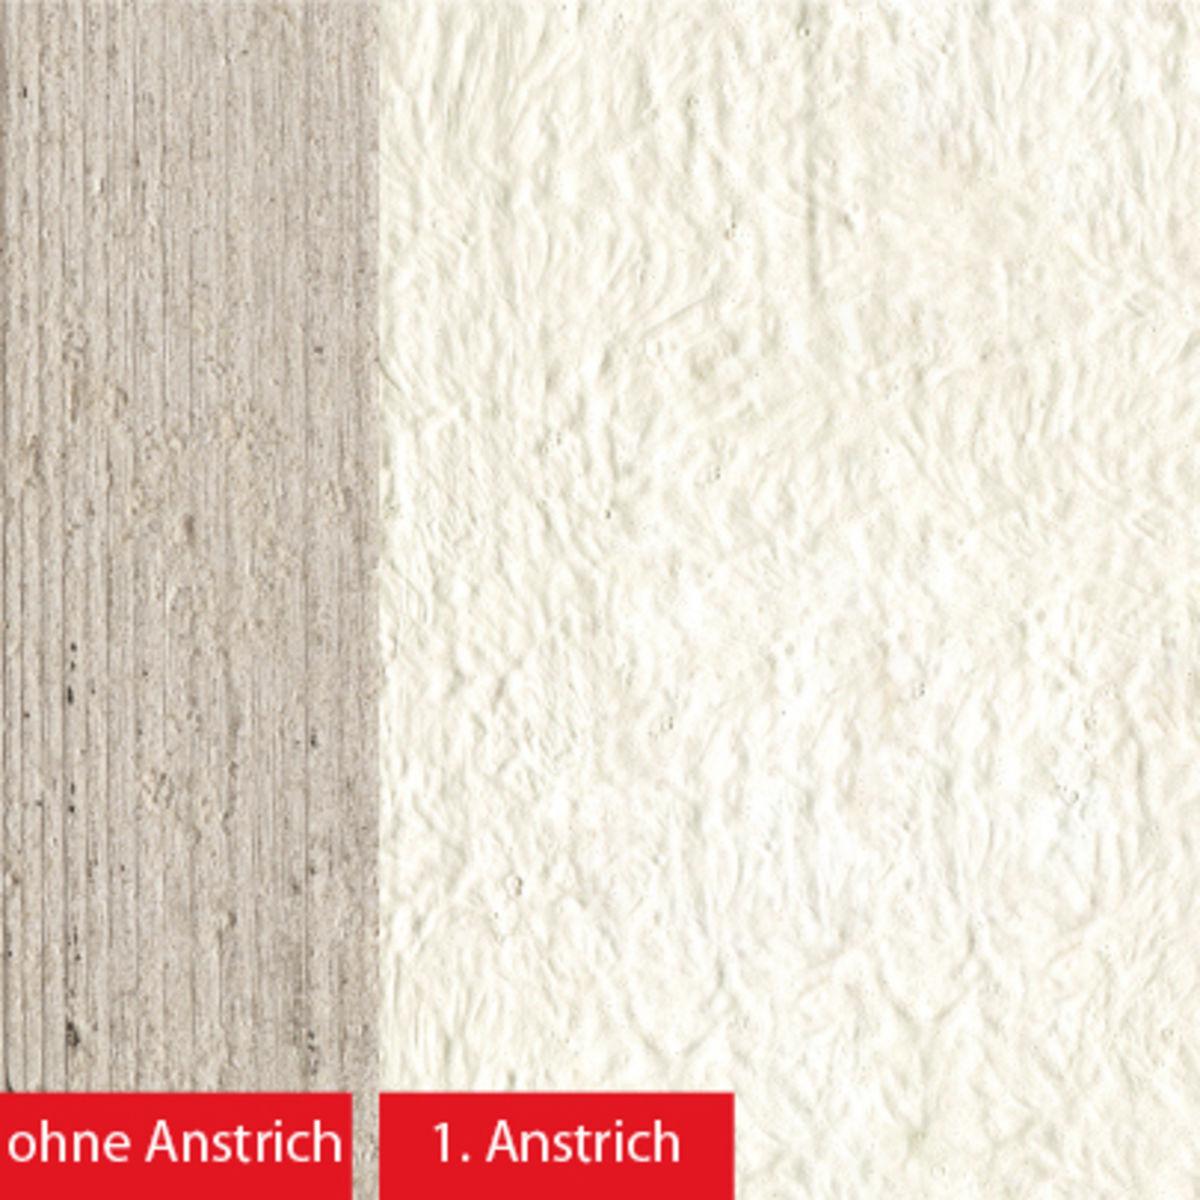 Bild 2 von BAUFIX professional Silikon-Fassadenfarbe weiß 10 L